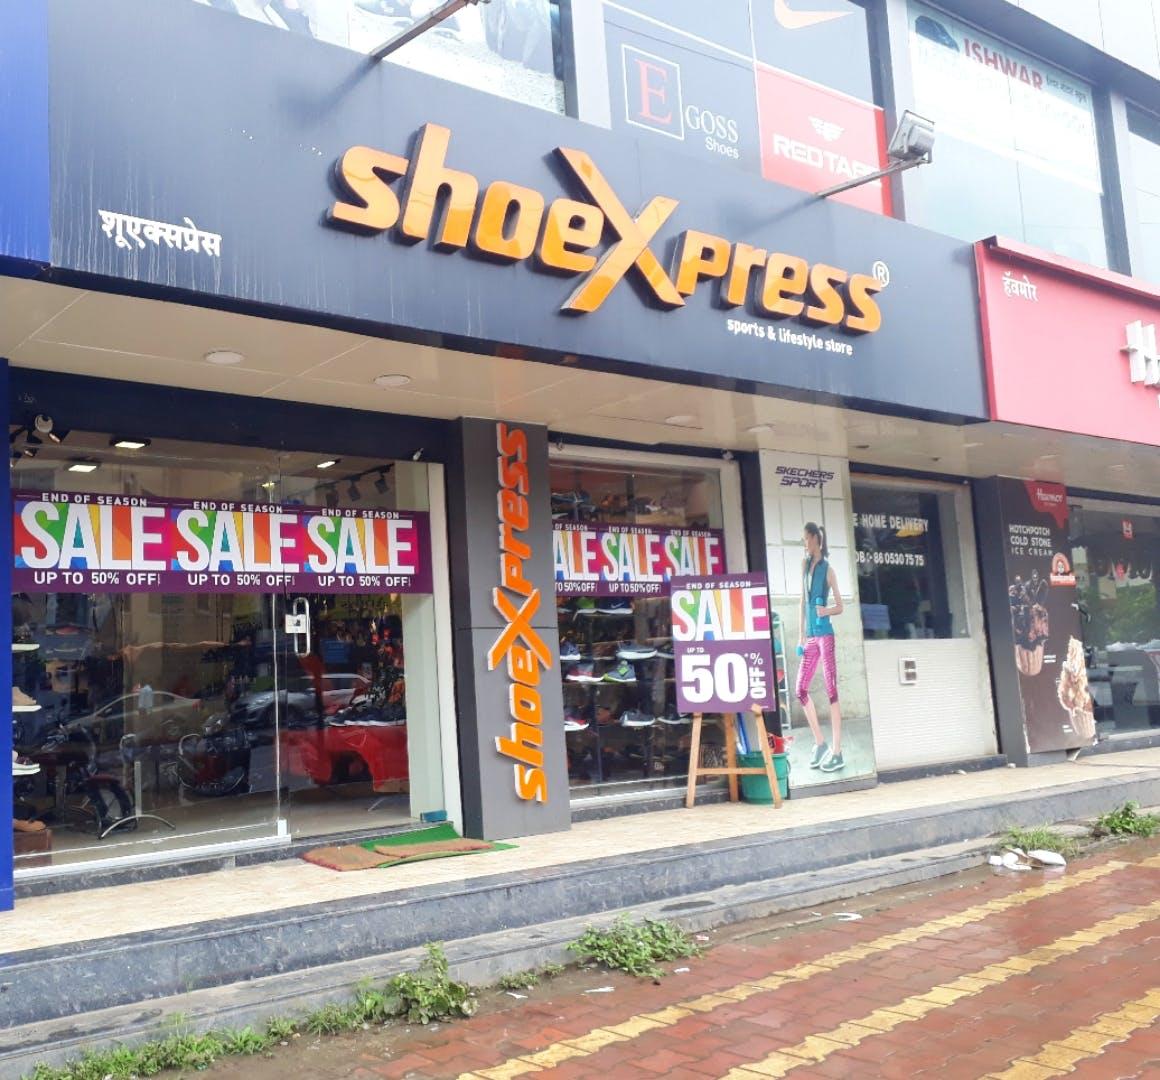 image - ShoeXpress